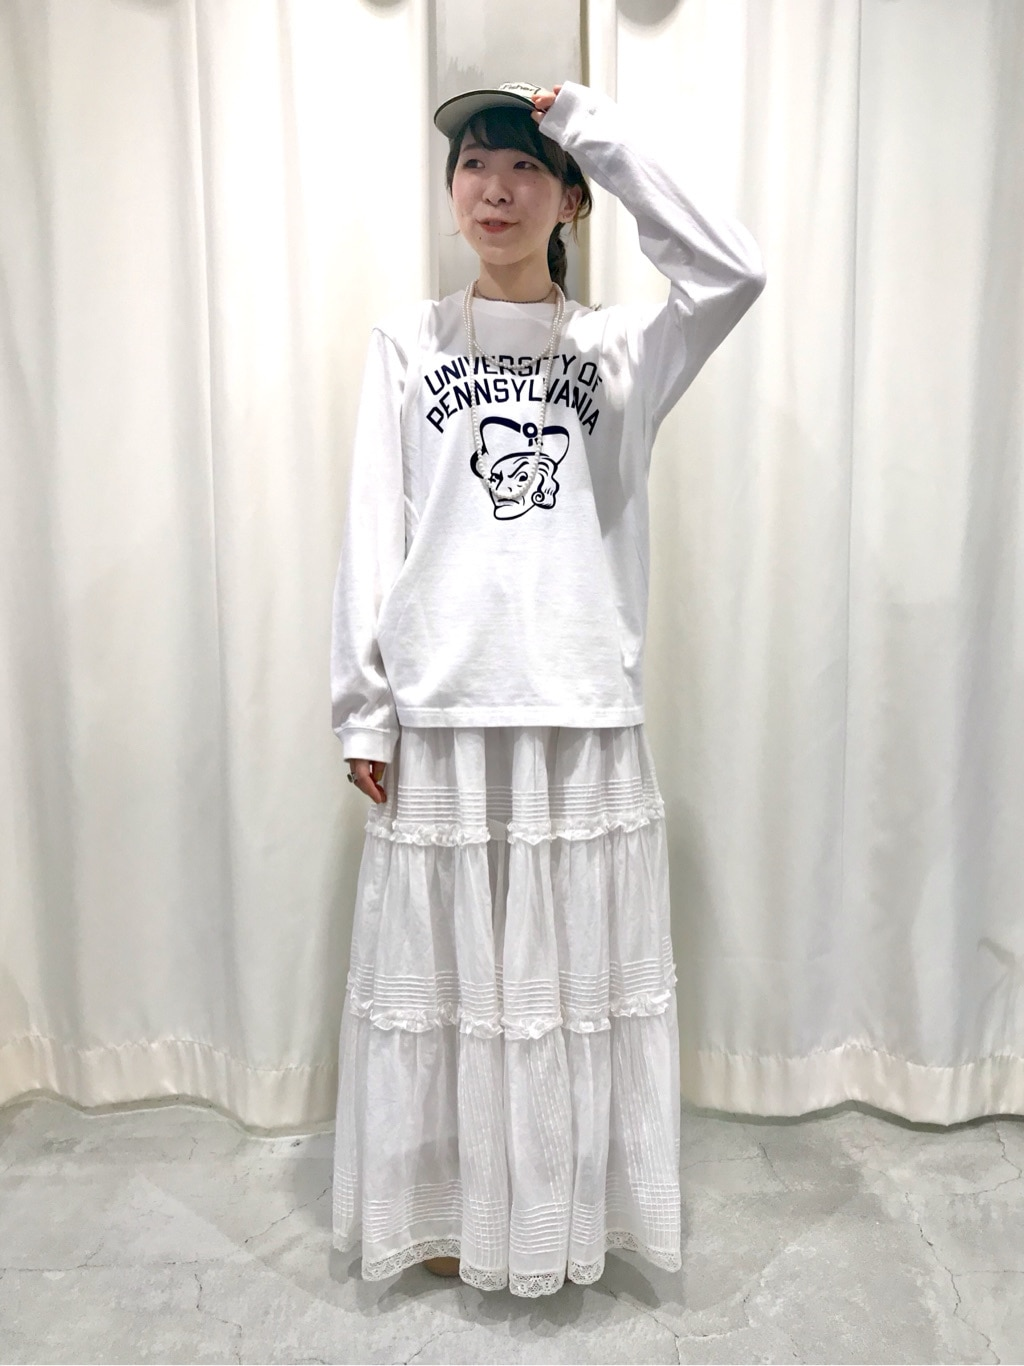 - PAR ICI CHILD WOMAN , PAR ICI 東京スカイツリータウン・ソラマチ 身長:154cm 2020.08.28